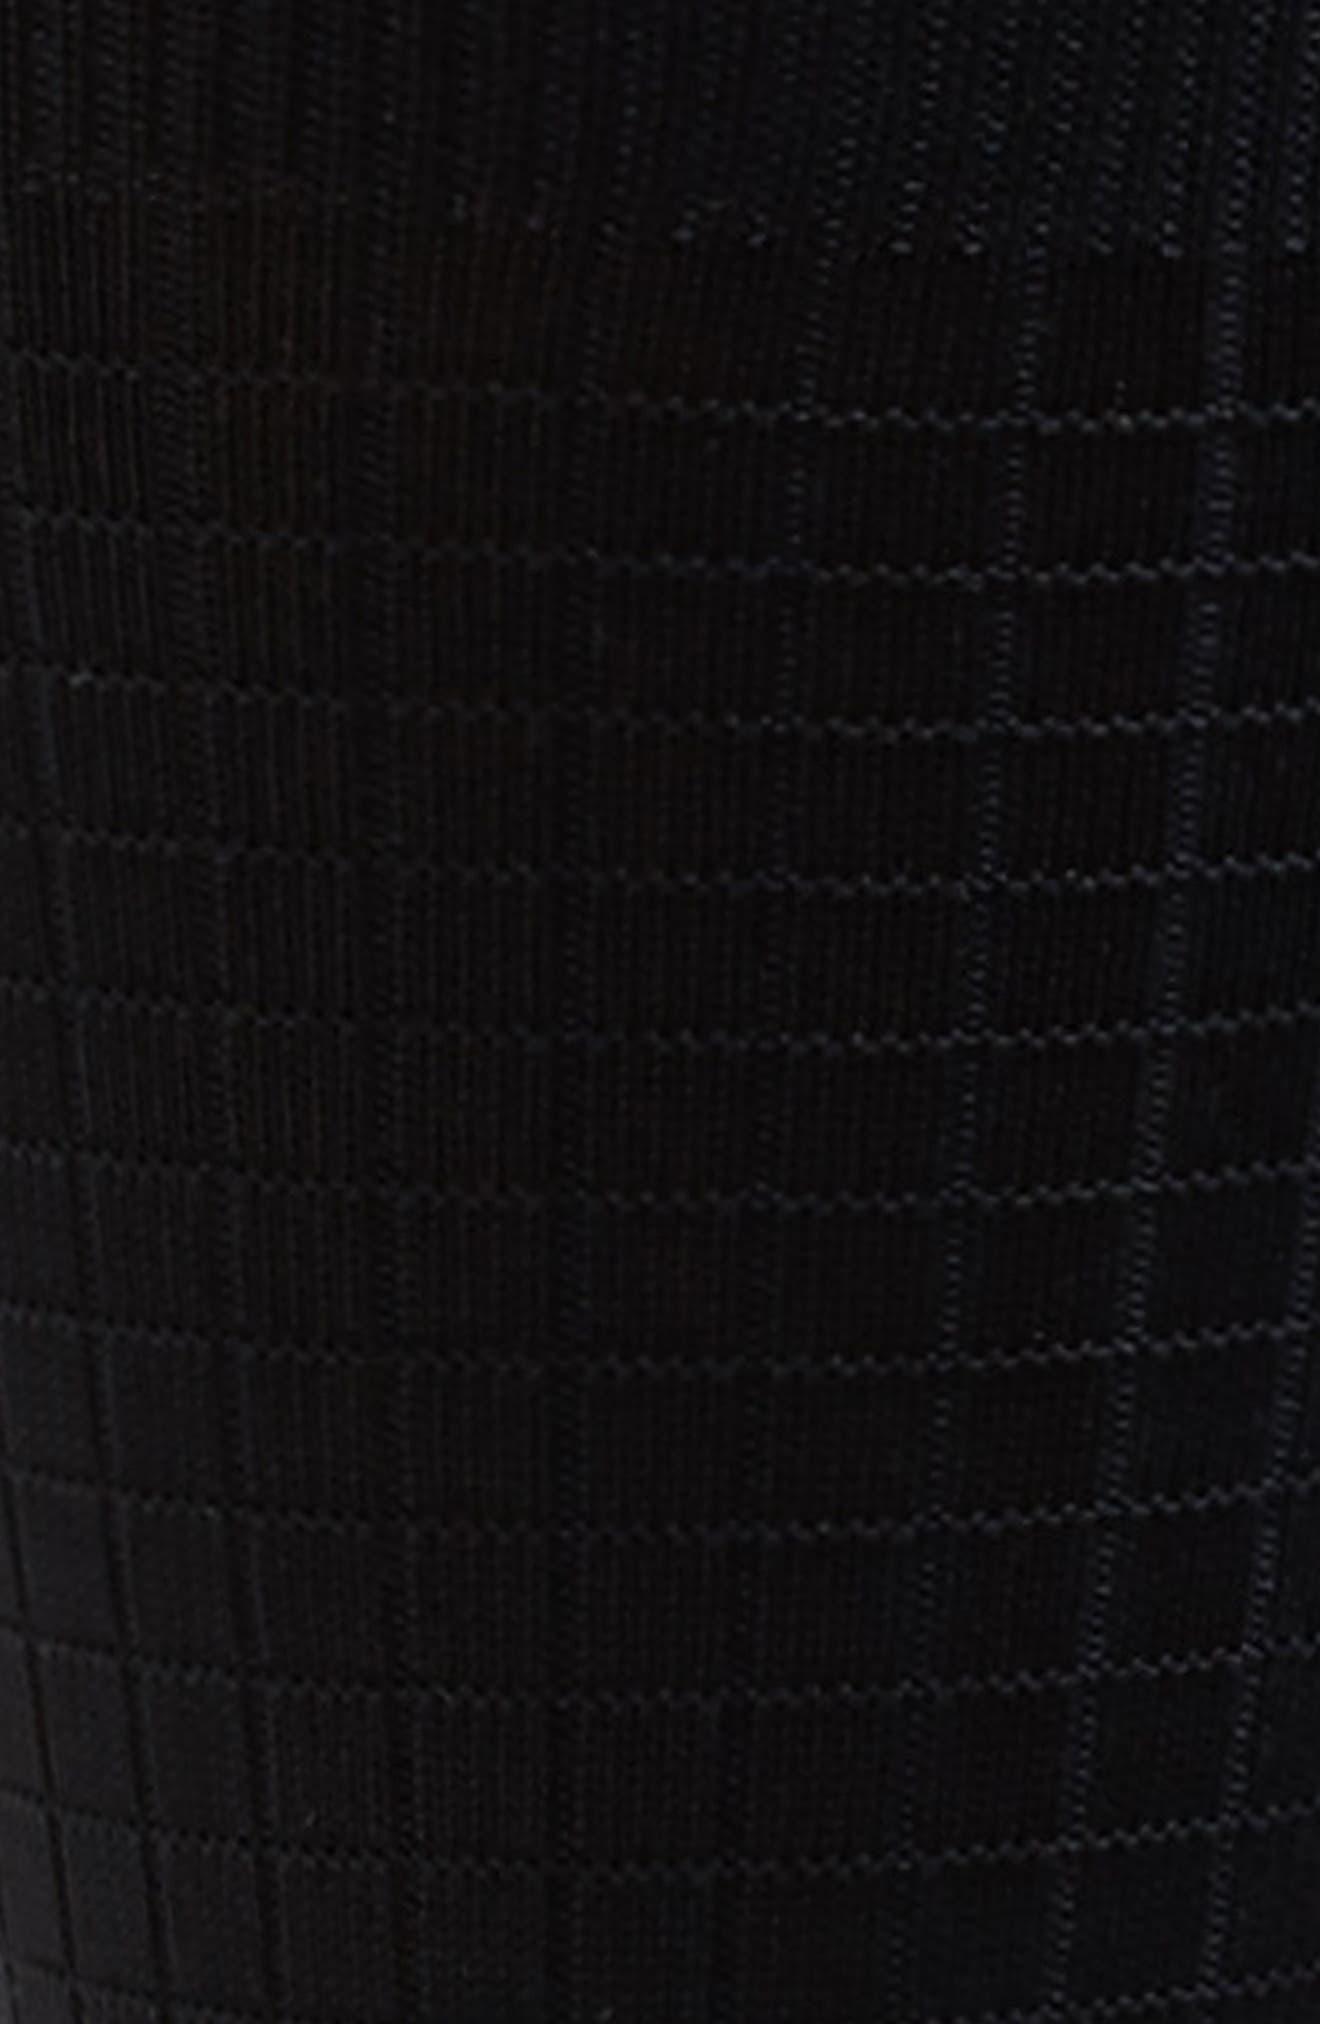 3-Pack Microfiber Socks,                             Alternate thumbnail 2, color,                             GREY